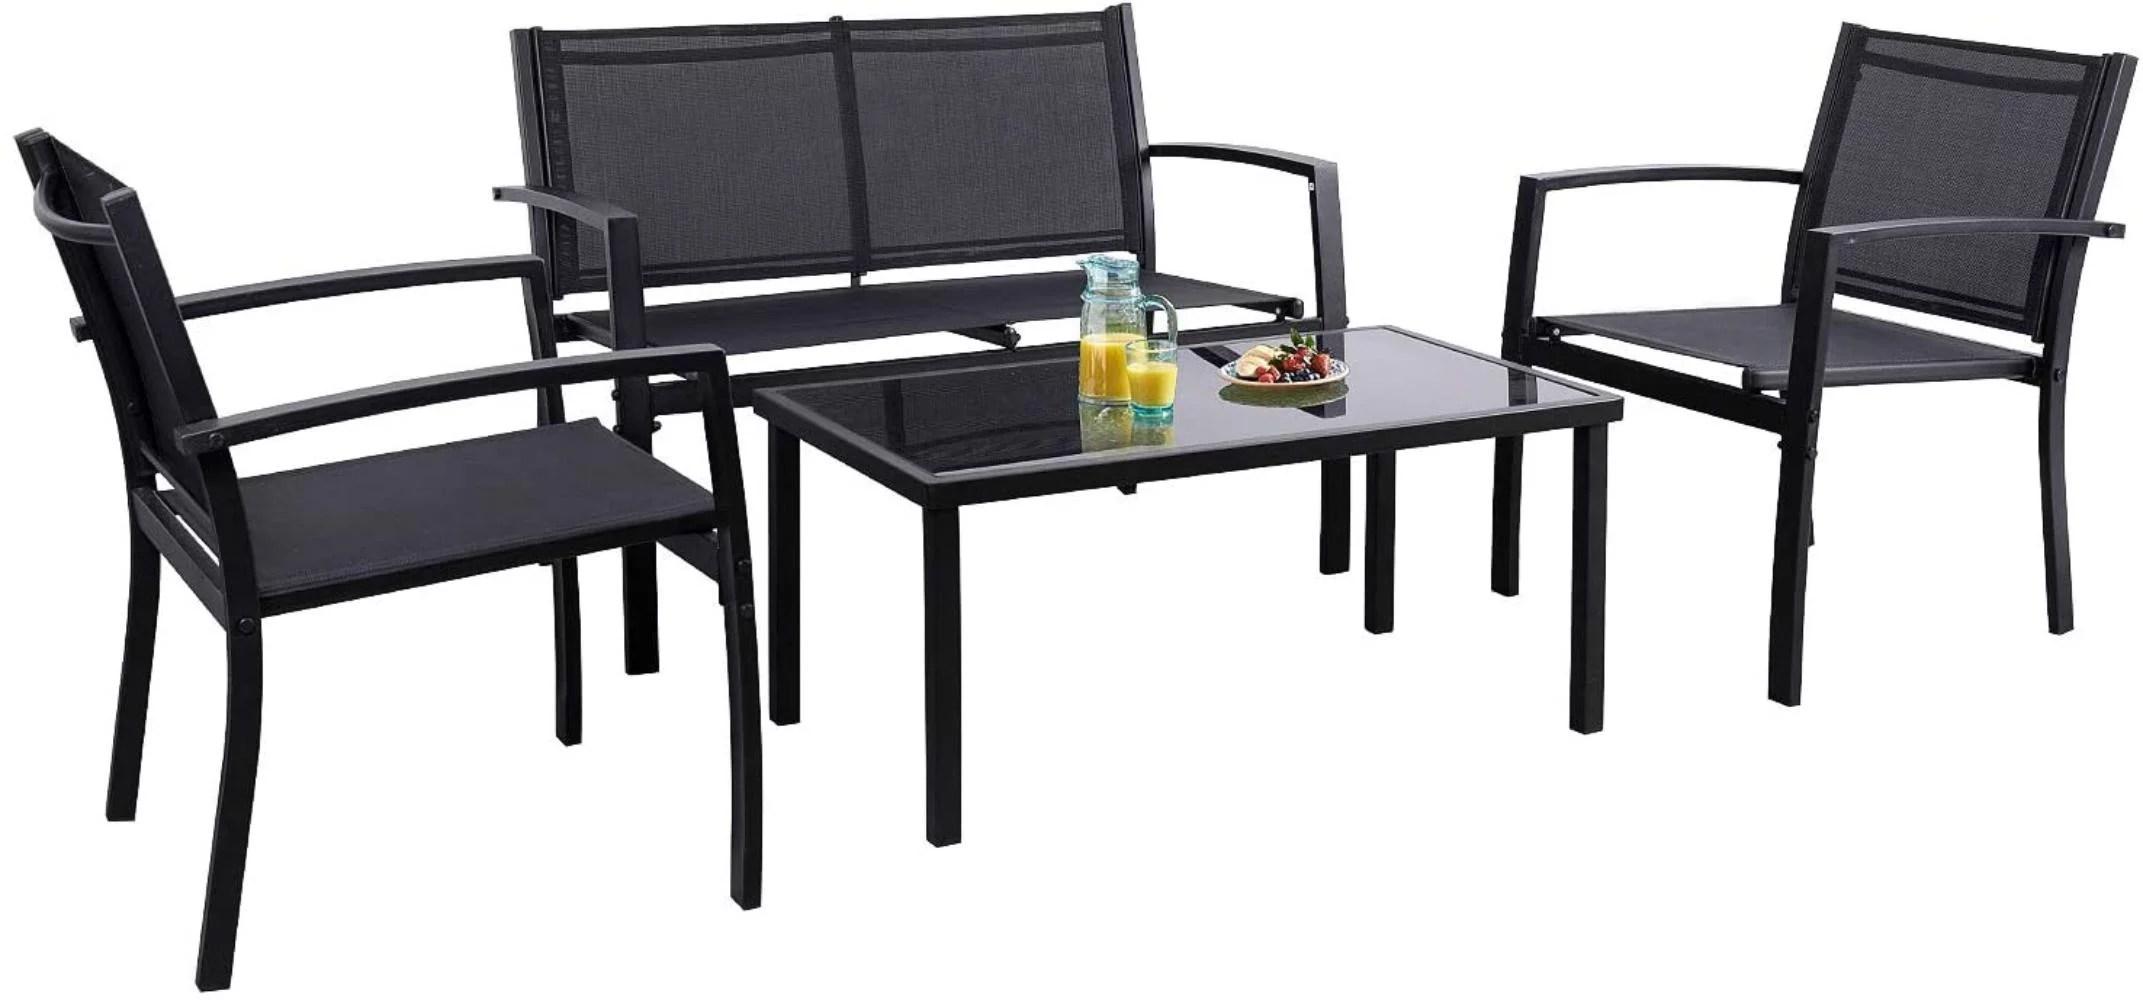 flamaker 4 pieces patio furniture outdoor furniture outdoor patio furniture set textilene bistro set modern conversation set black bistro set with